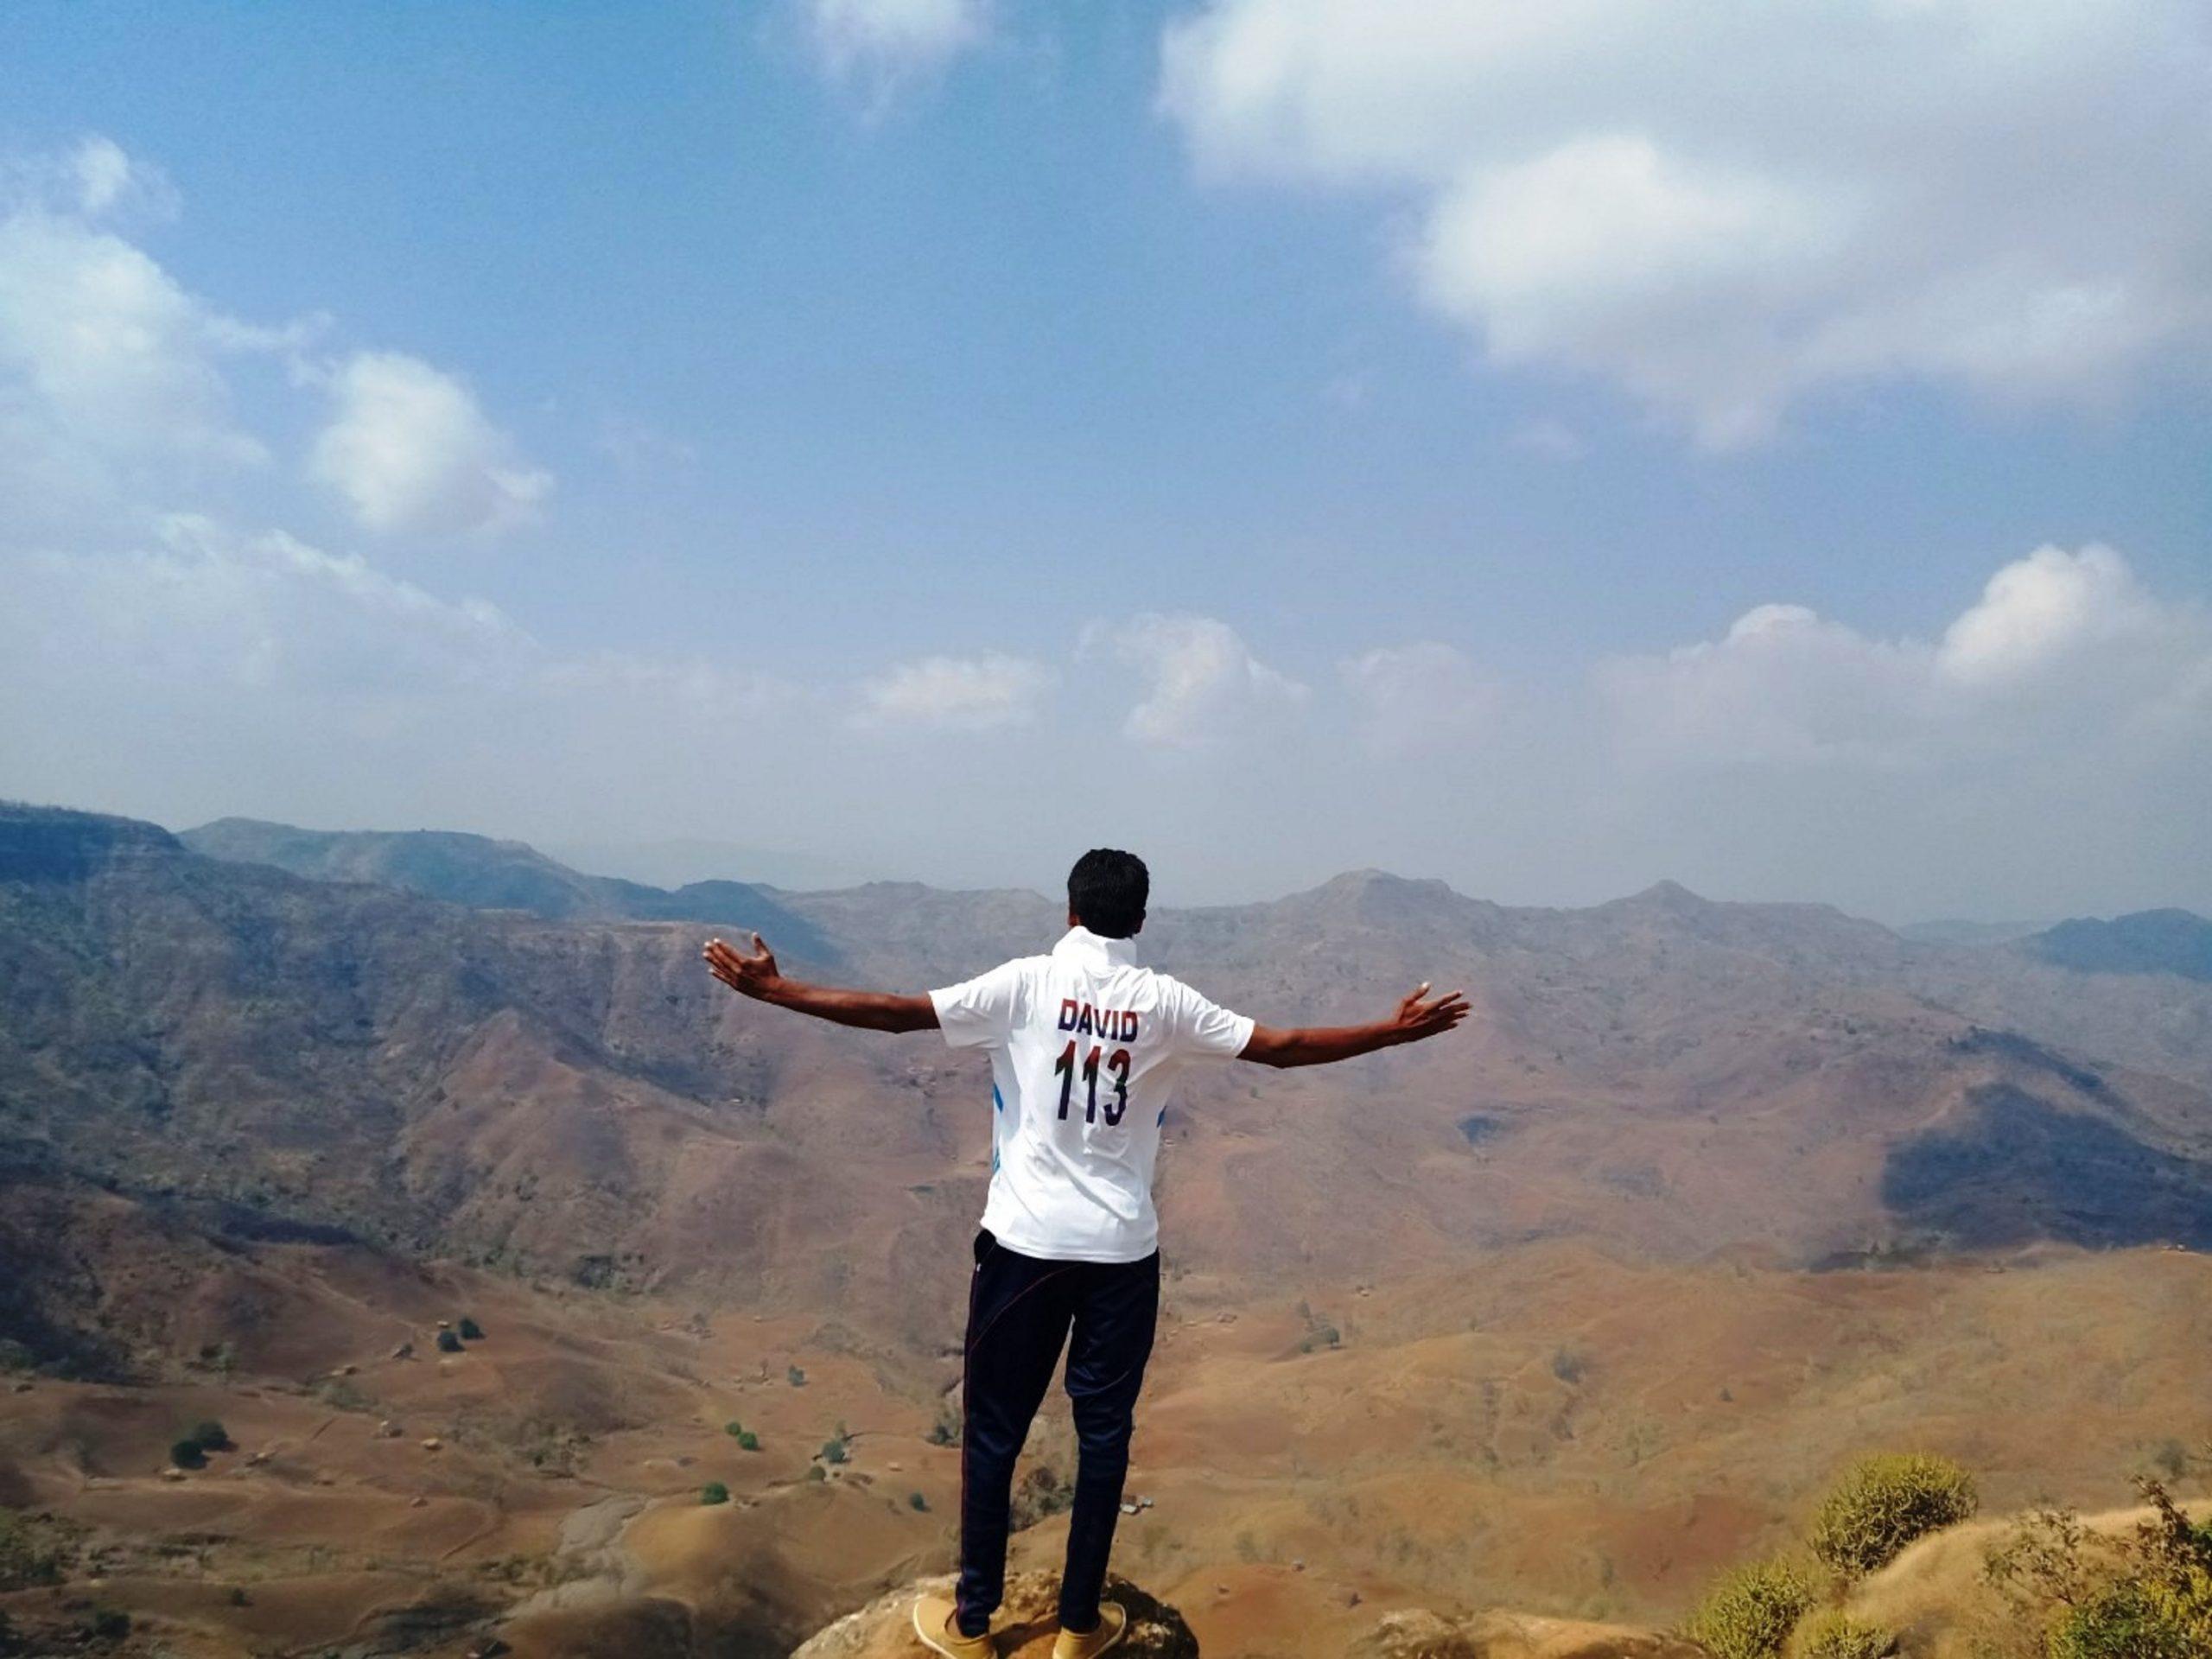 A man on a mountain top